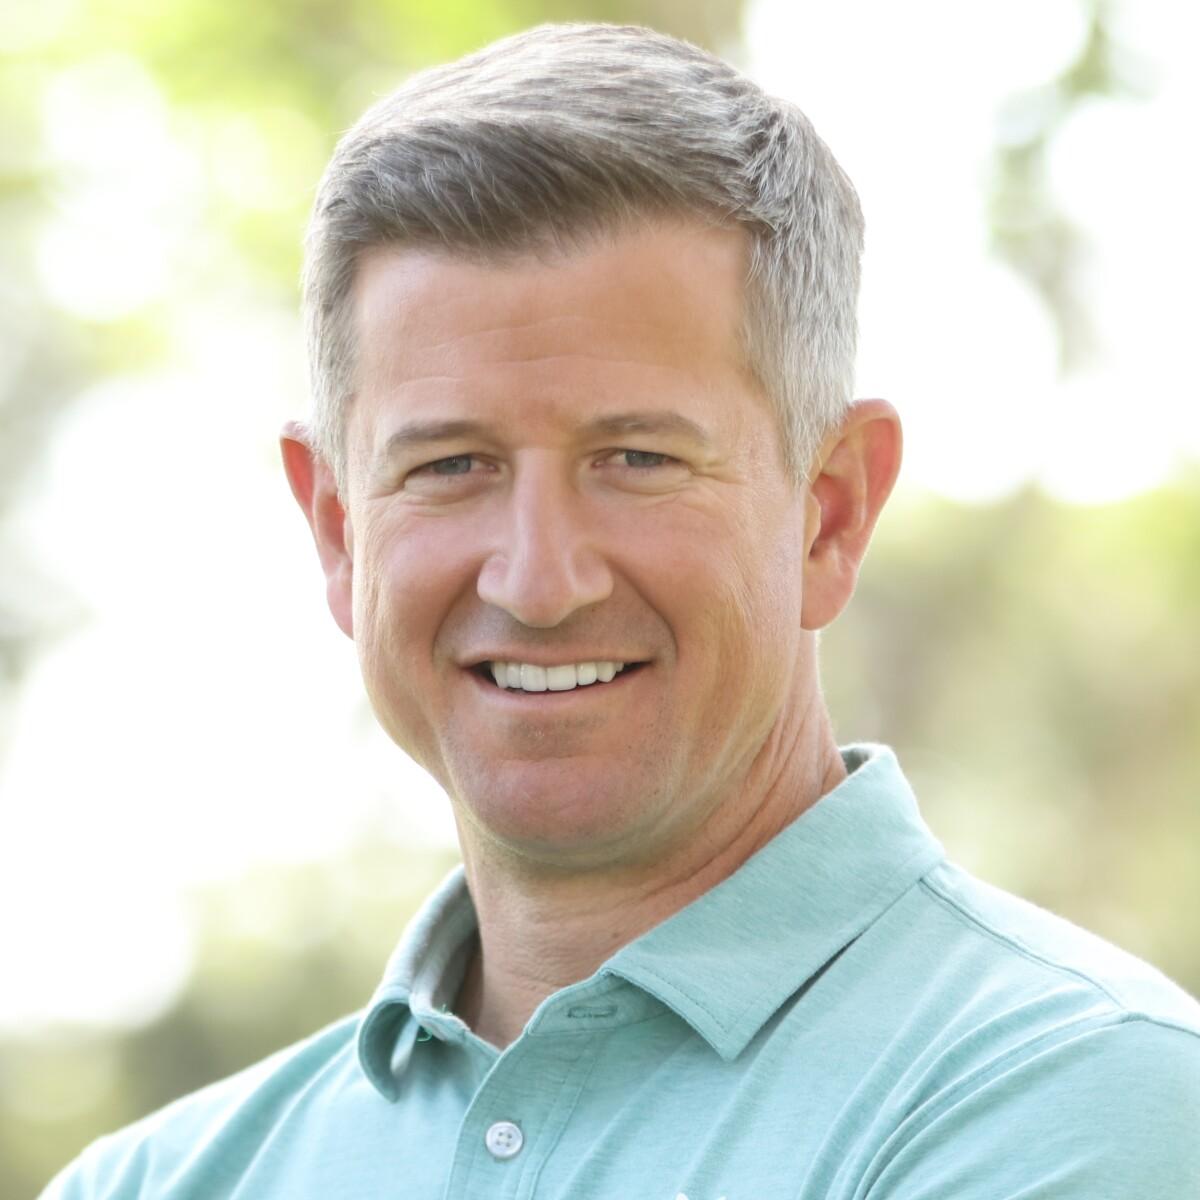 Matt Ginella Golf Advisor's Editor-at-Large